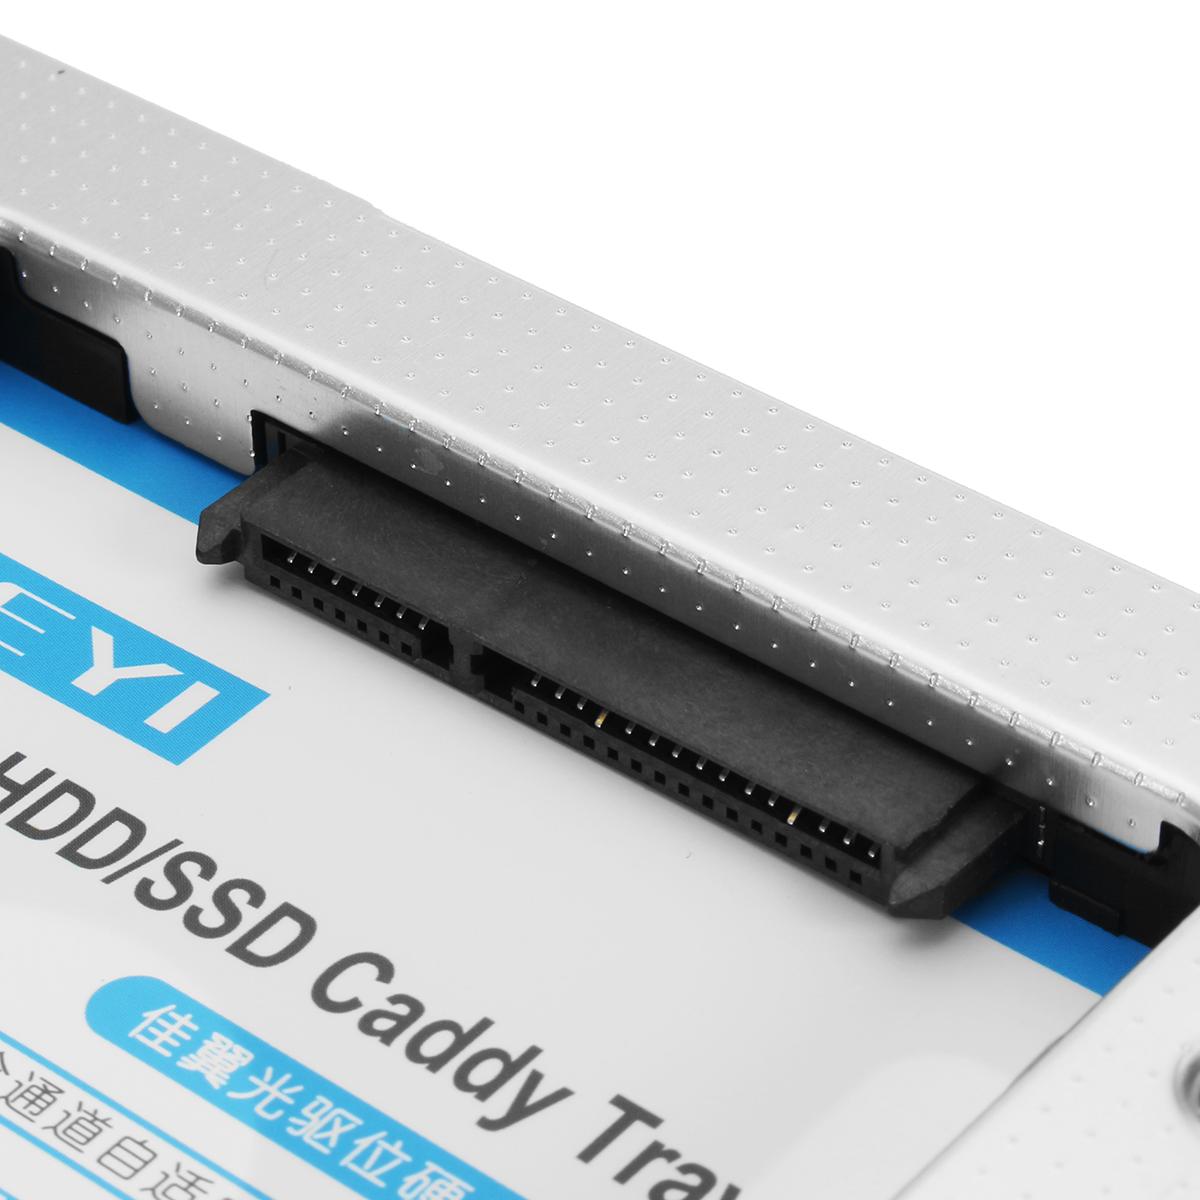 JEYI Universal SATA 9,5 мм 12,7 мм жесткий диск SSD жесткий диск Caddy Tray Laptop CD / DVD-ROM жесткий диск Caddy - фото 5